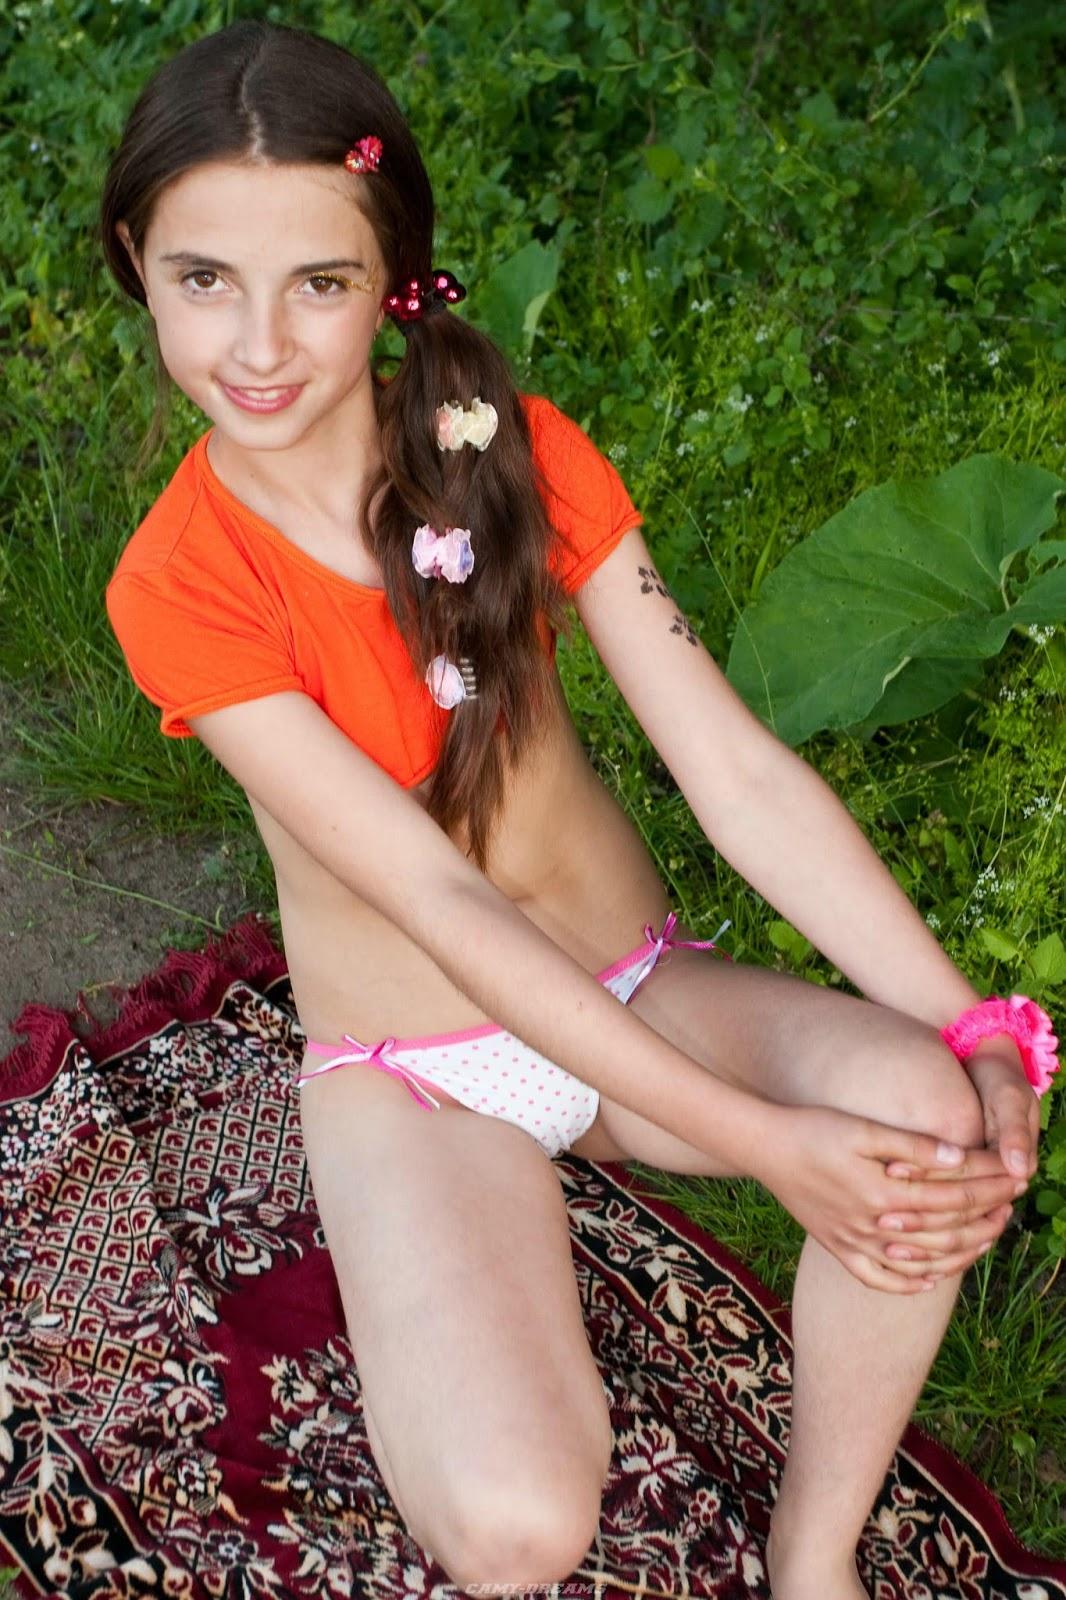 nude of bangladeshi girl